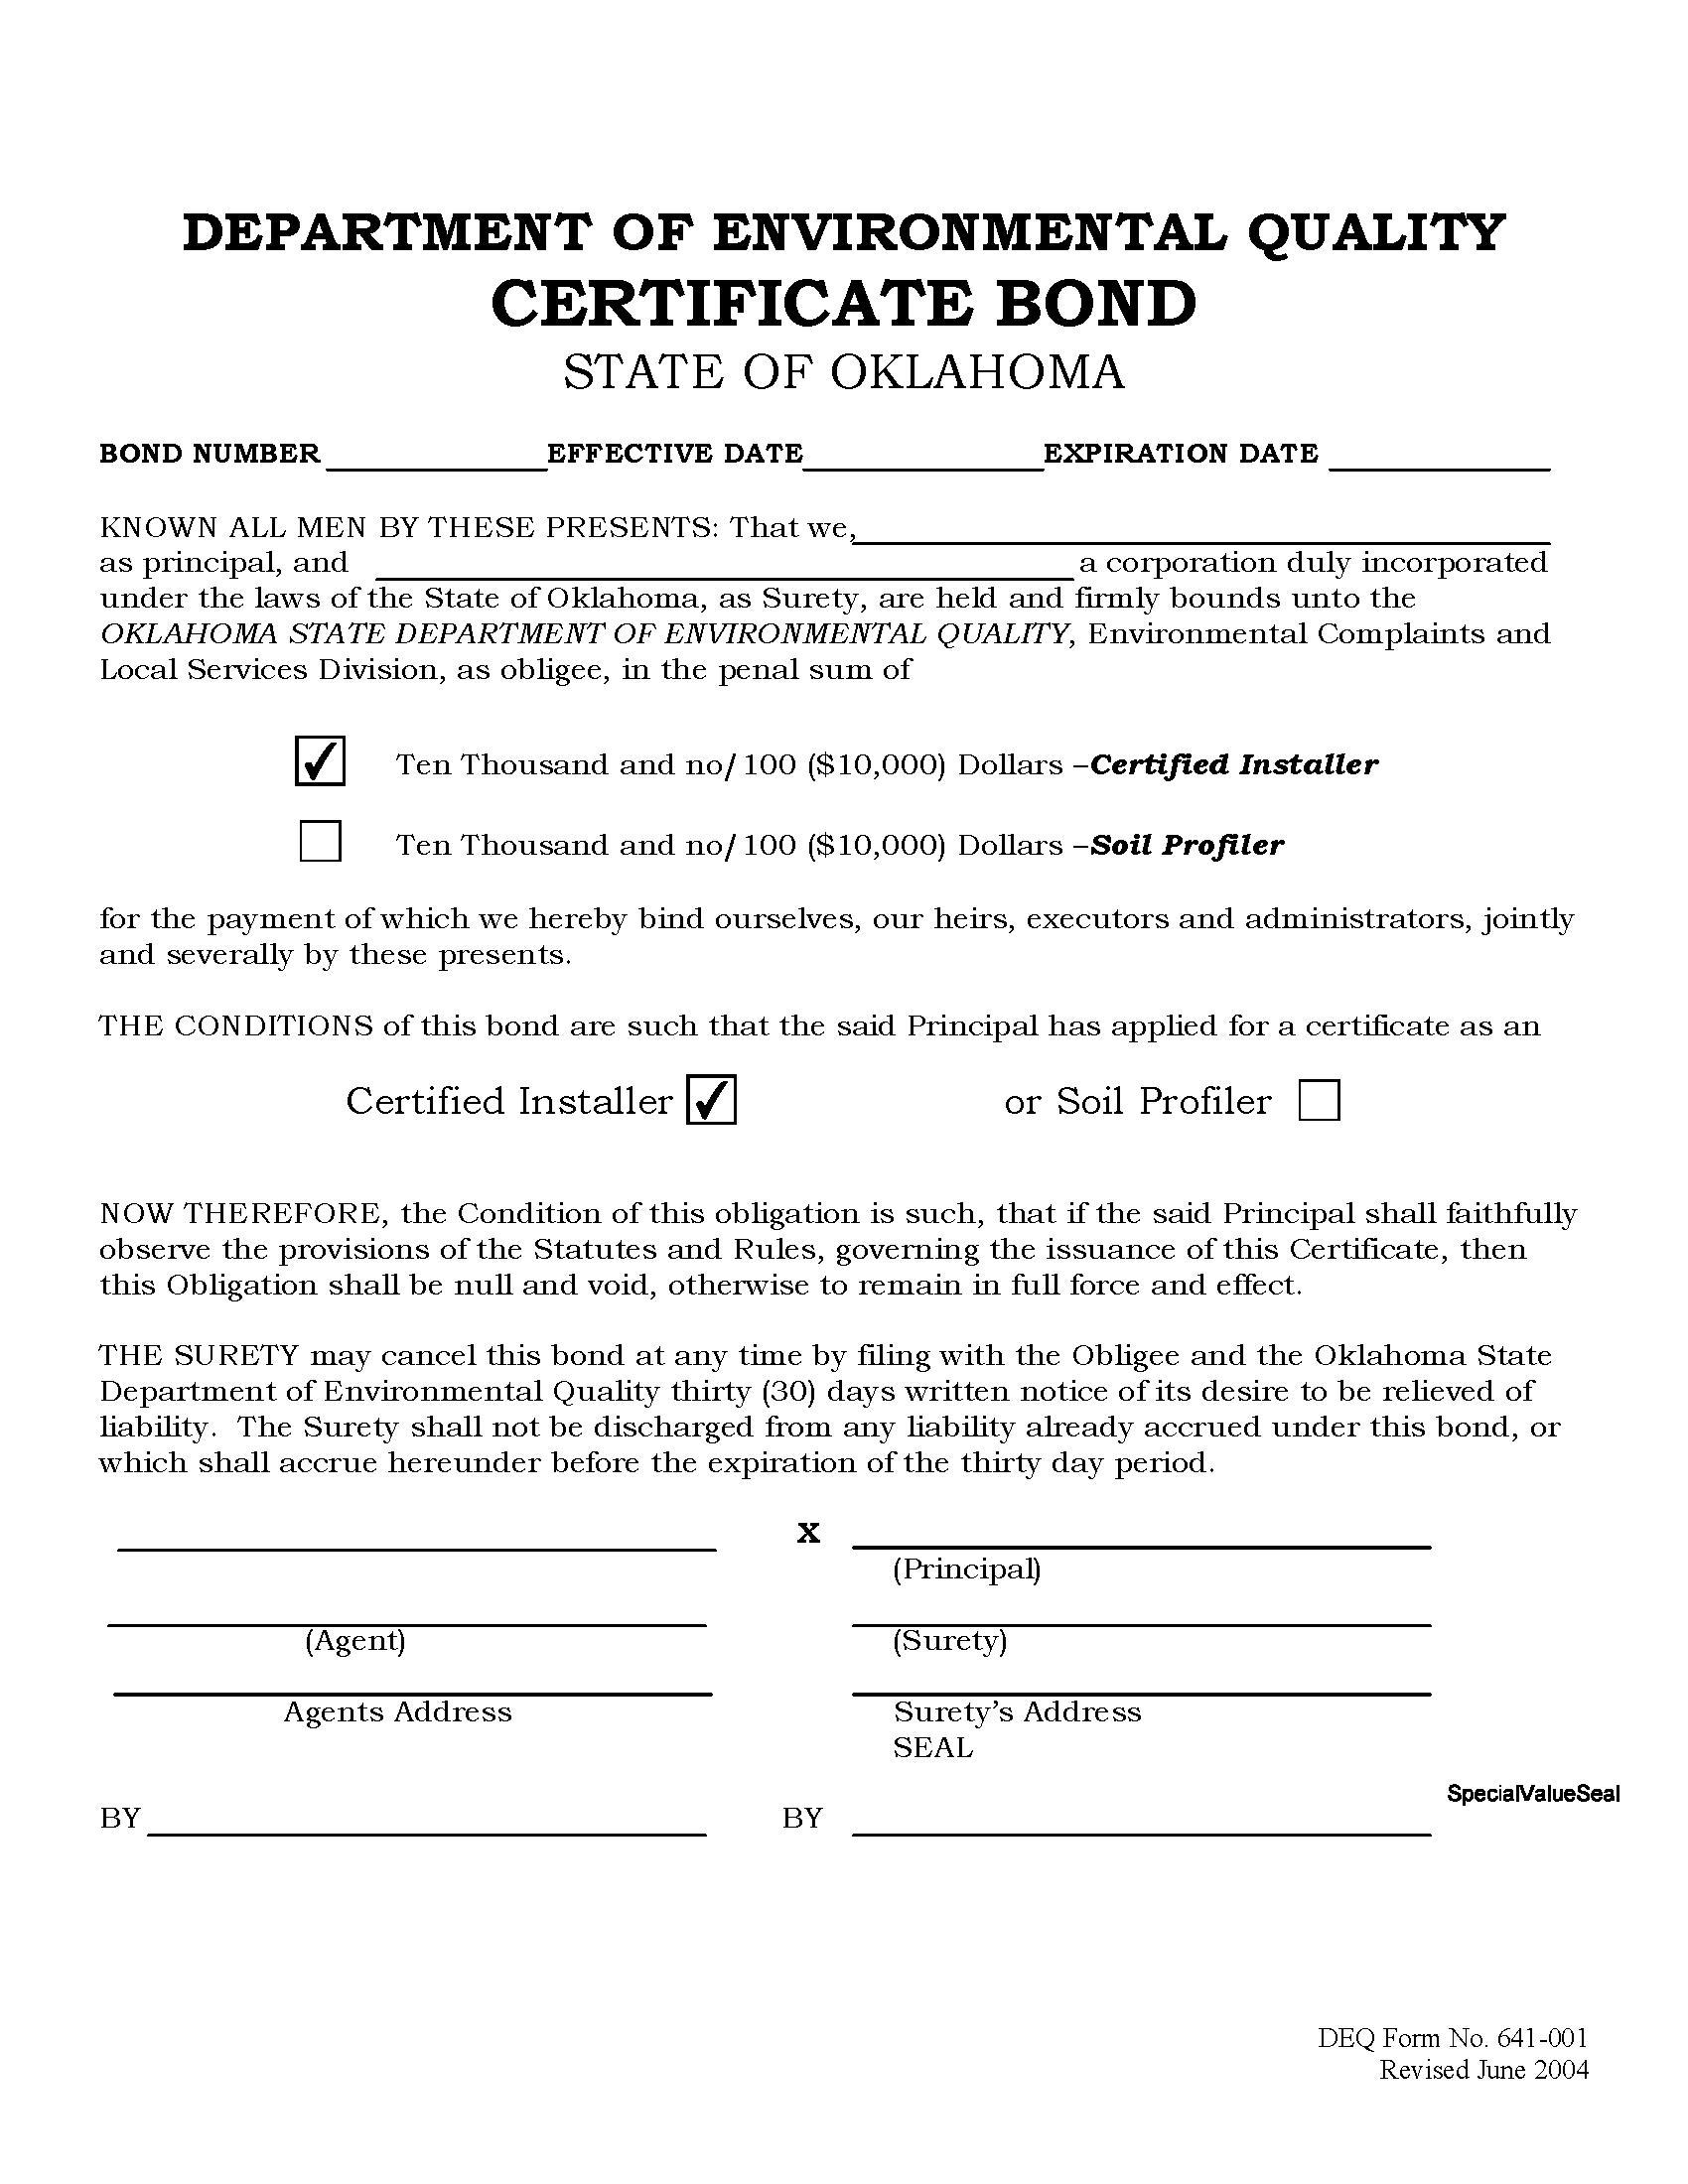 DEQ Certified Installer Certificate sample image